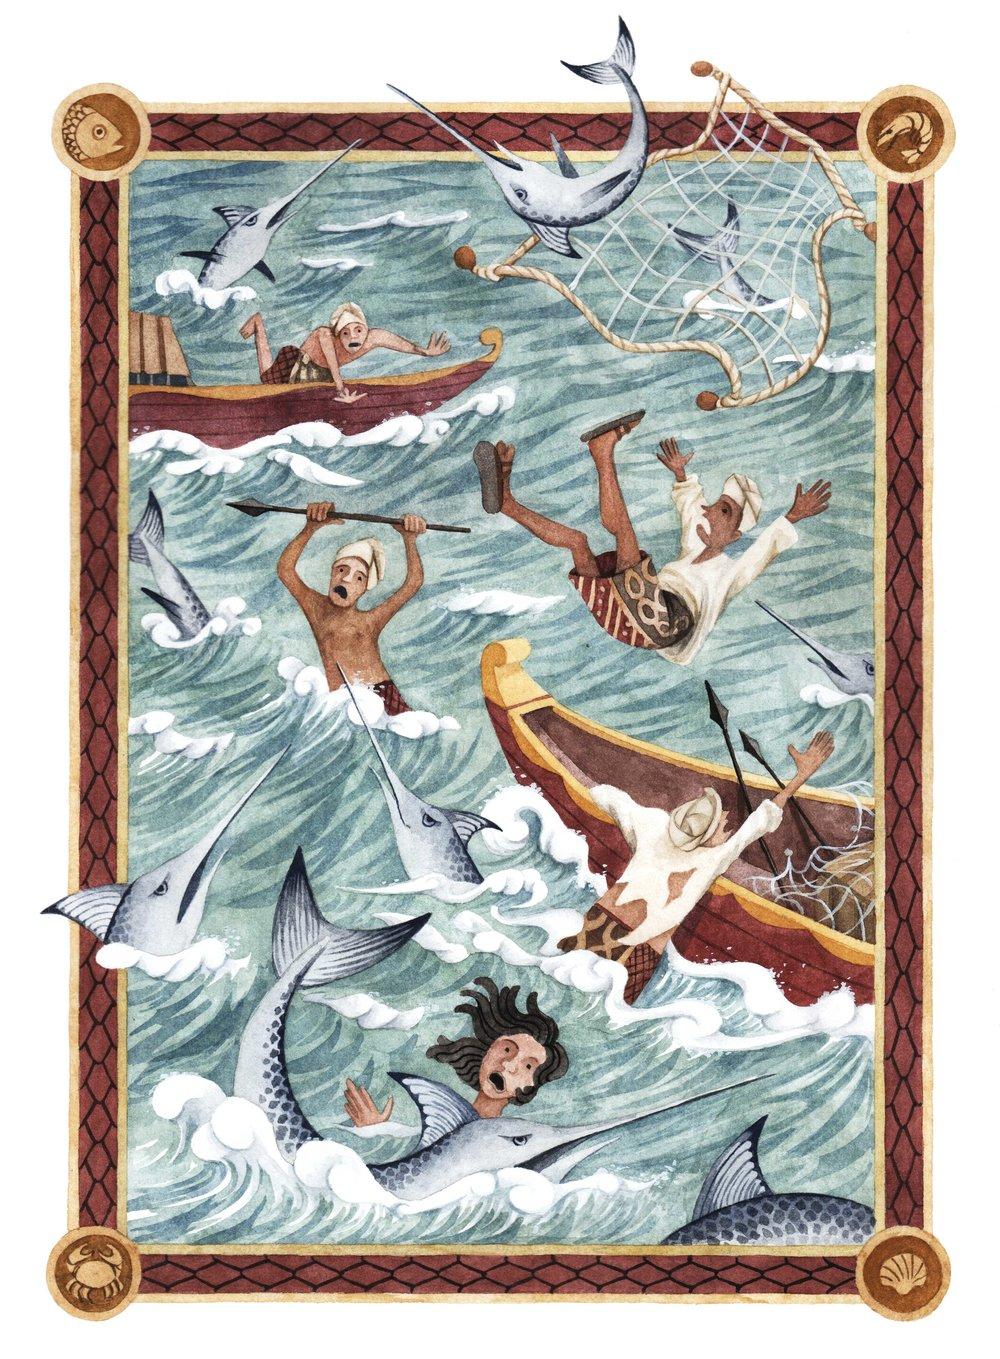 Singapore folktales: Attack of swordfish